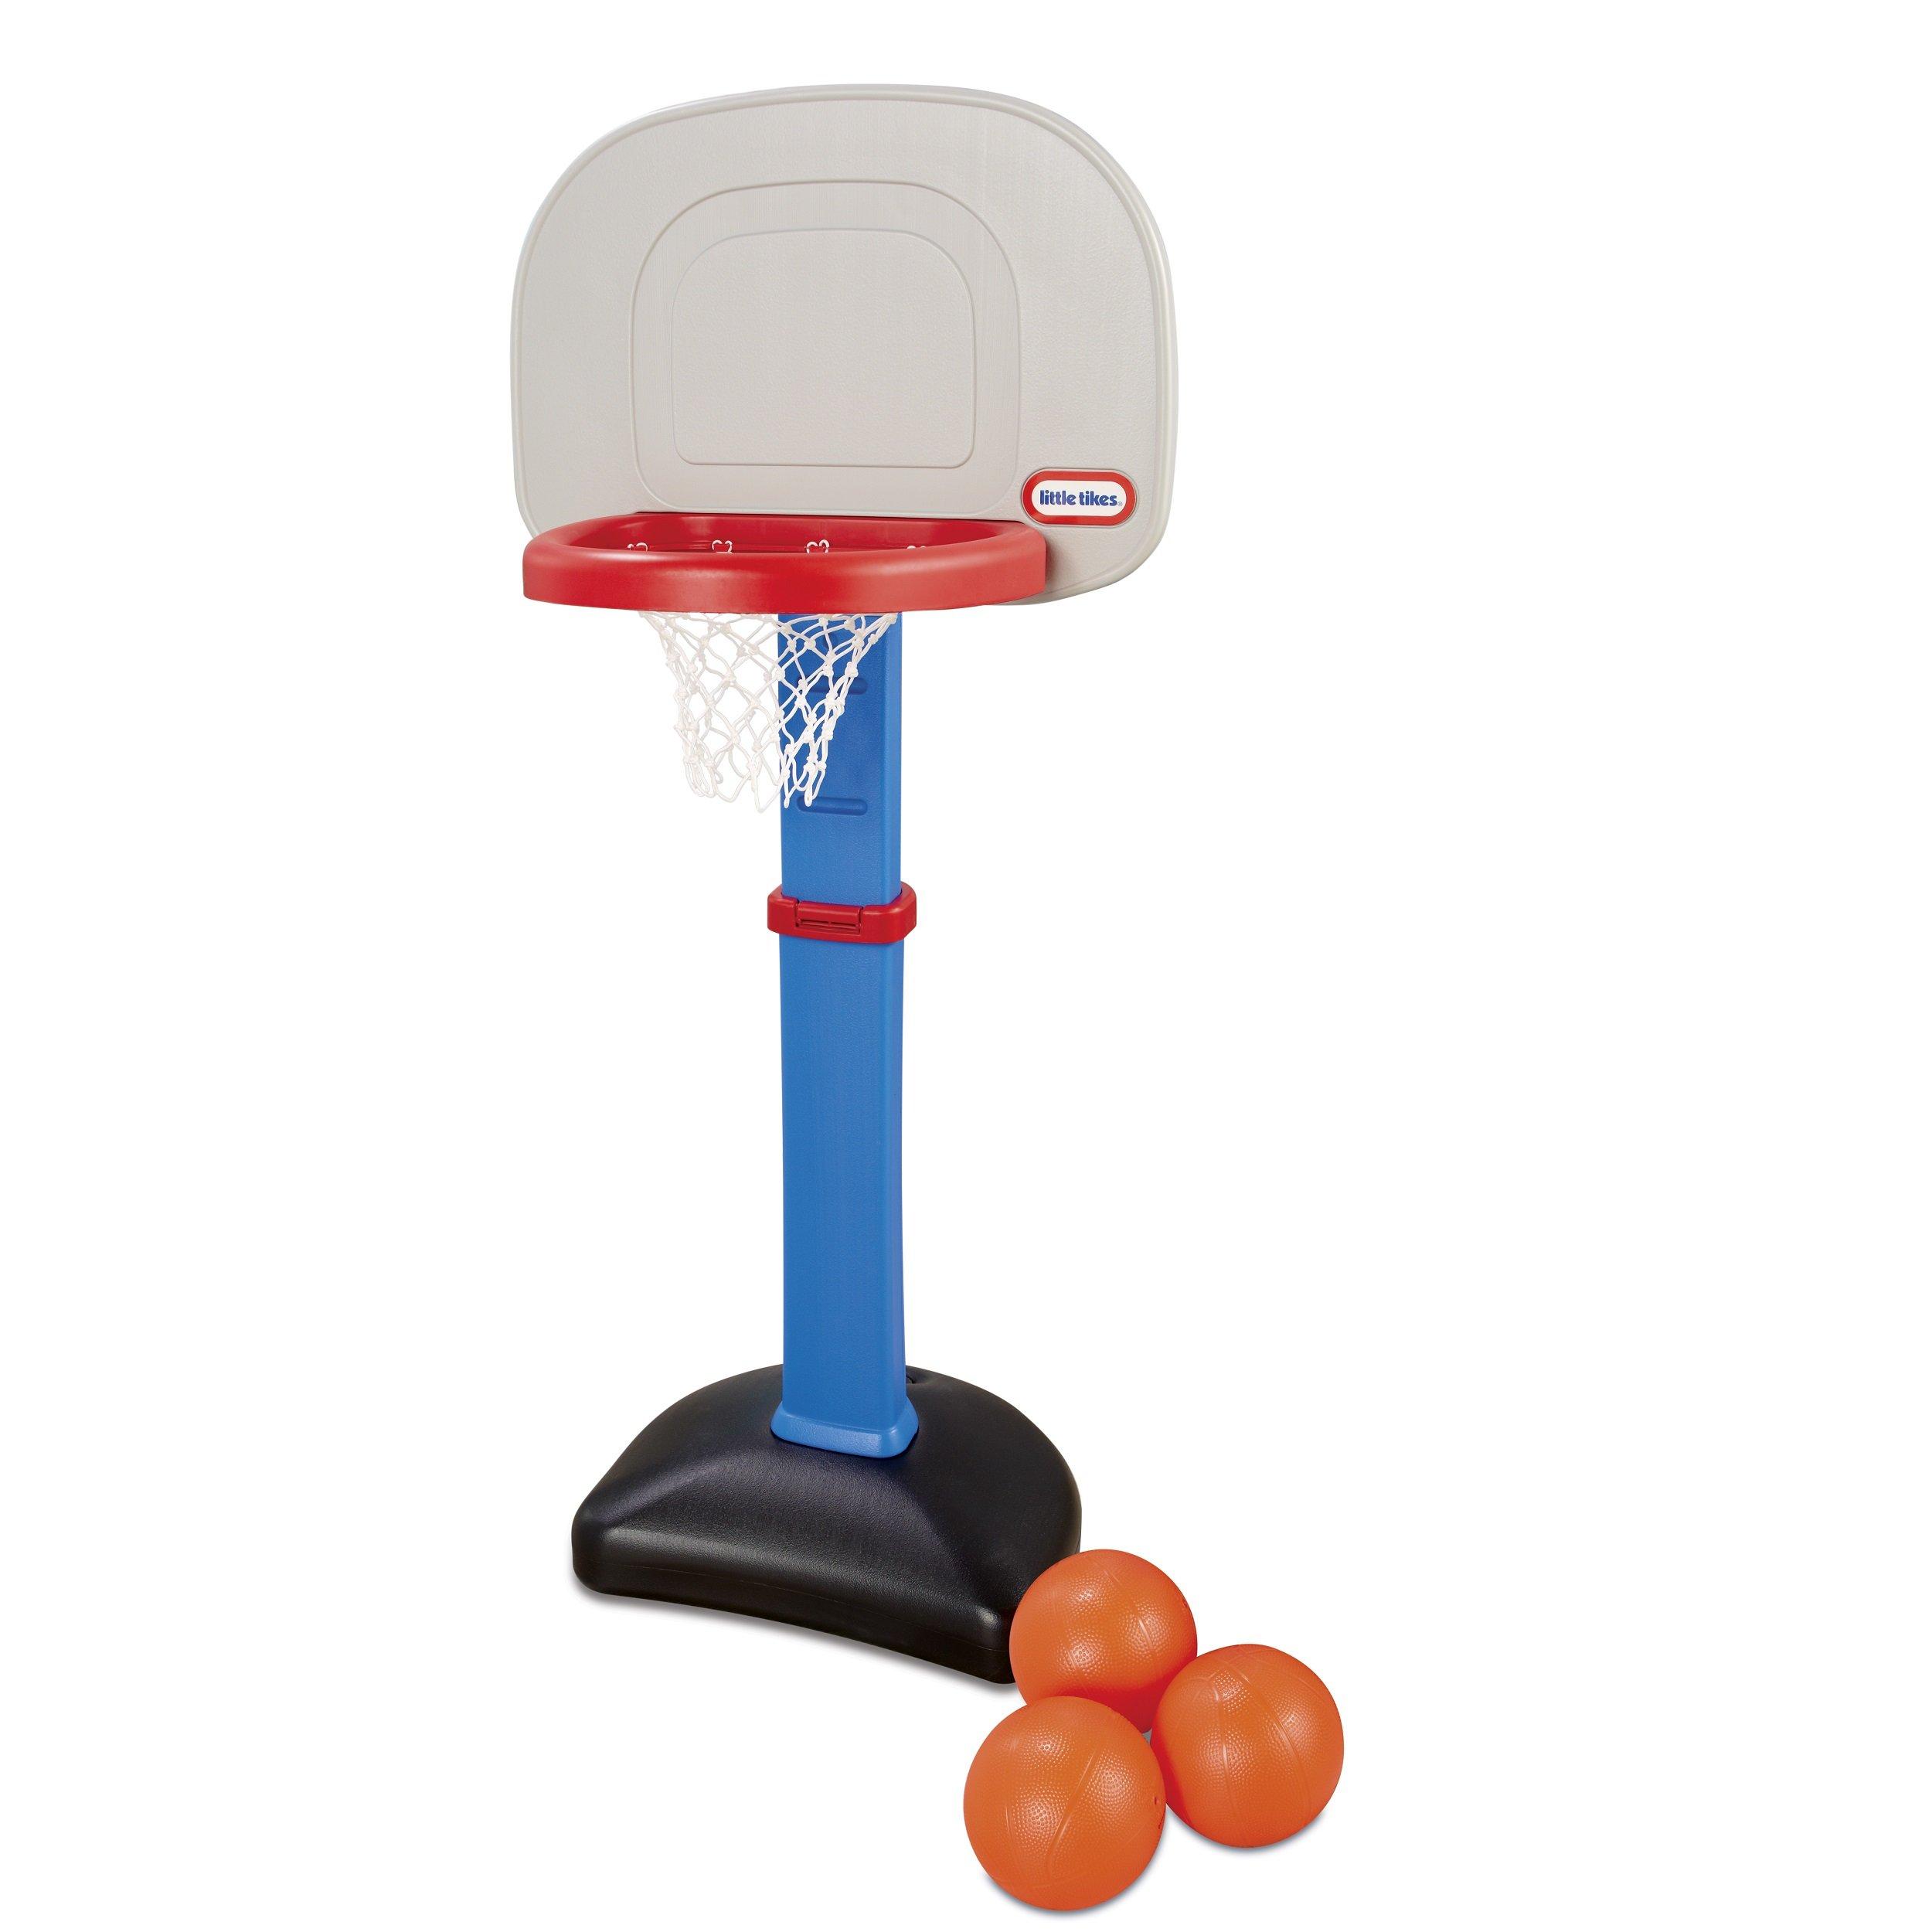 Little Tikes Easy Score Basketball Set Blue 3 Balls - Amazon Exclusive